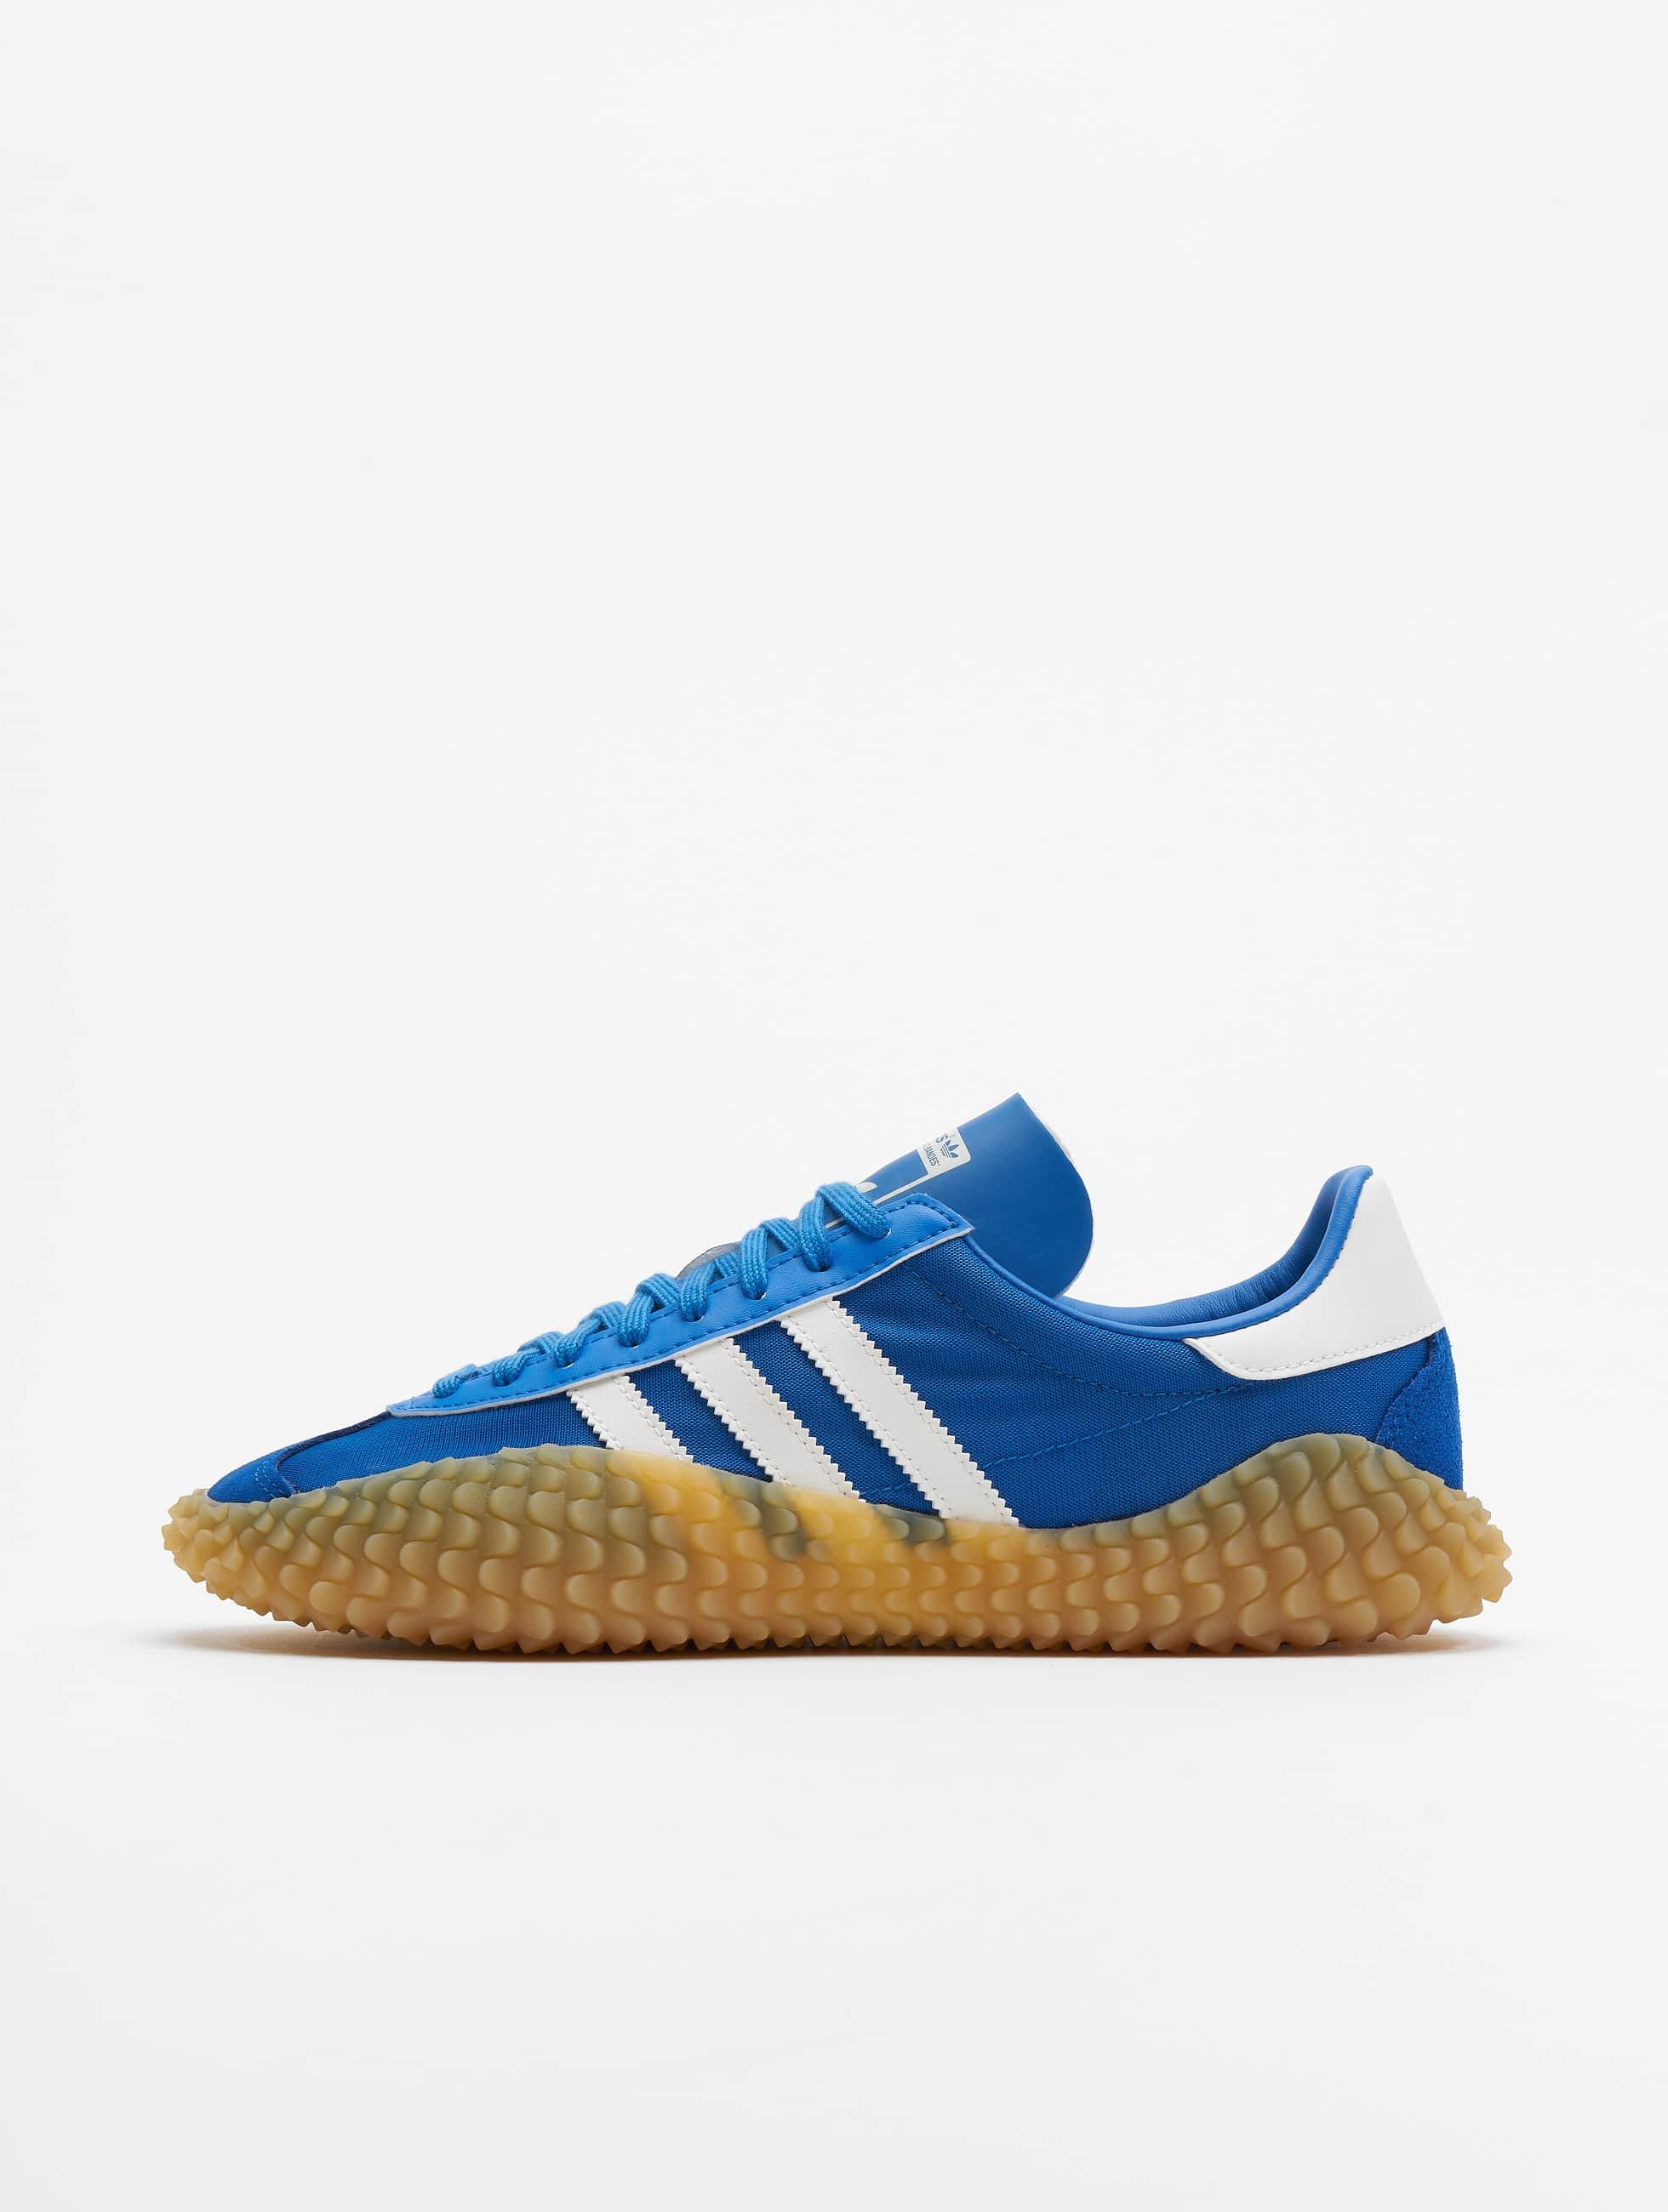 adidas Country OG (dunkelblau weiß) | 43einhalb Sneaker Store